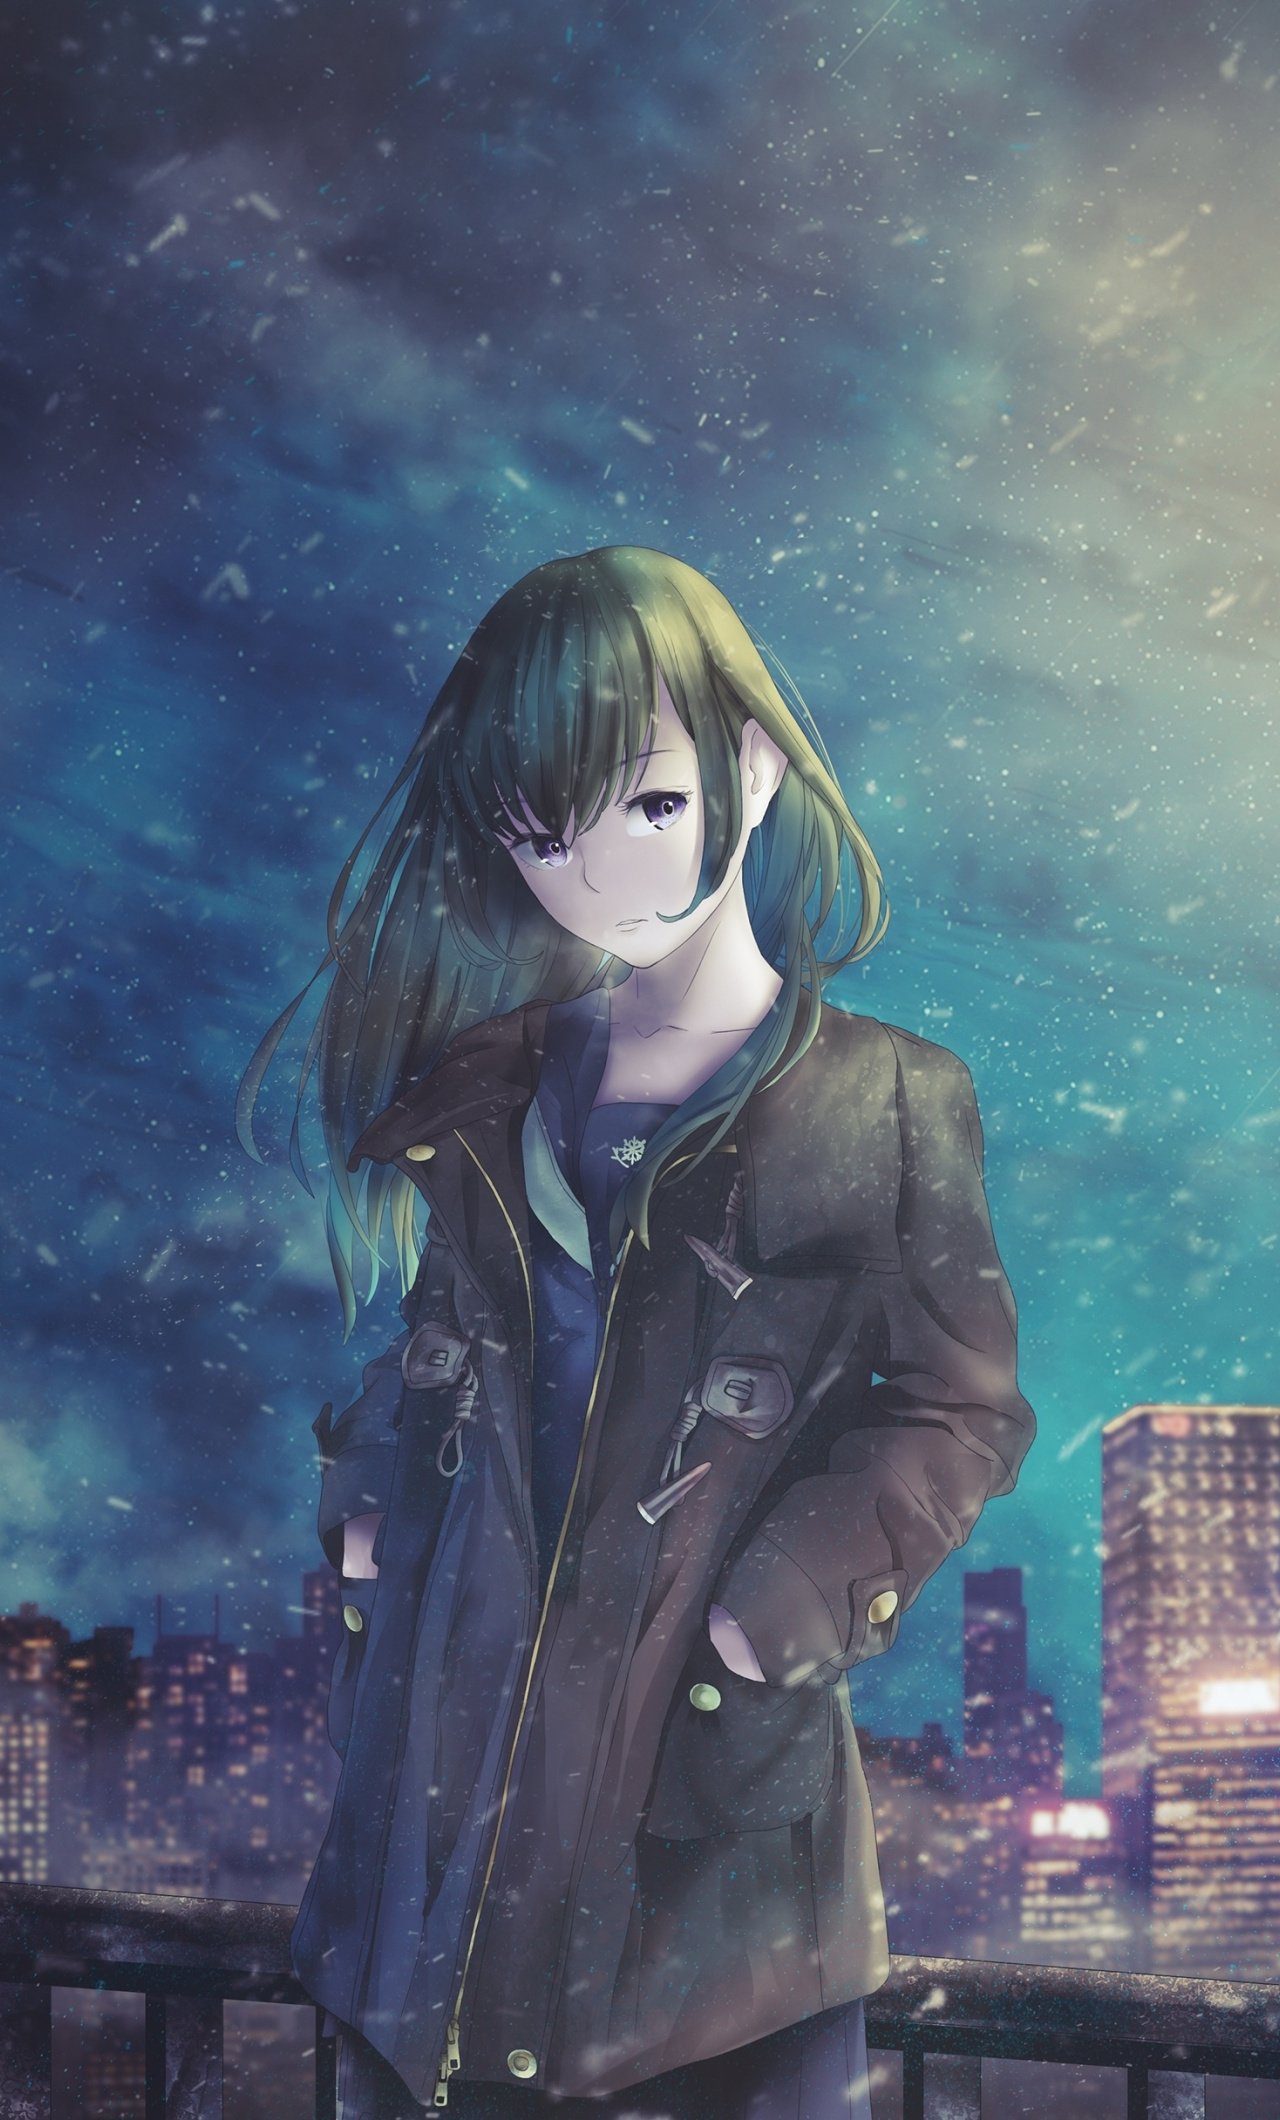 Night Out Original Cute Anime Girl Wallpaper Iphone Anime Girl Wallpaper Hd 1280x2120 Wallpaper Teahub Io